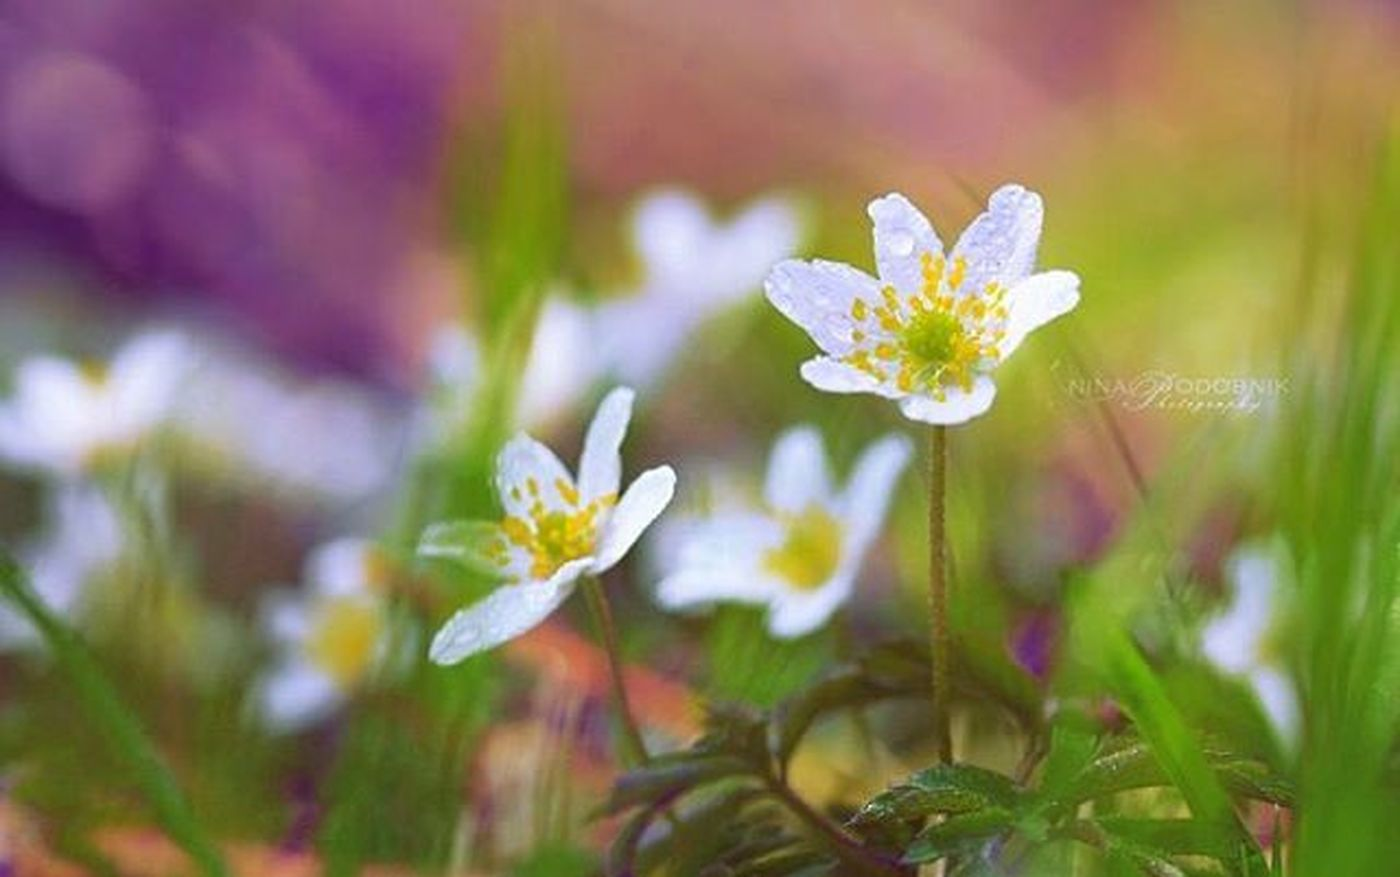 Awakening ☺ Spring Springtime Springmood Colors Nature_captures Naturephotography Macrophotography Macro_captures_ Instadaily Photooftheday Flowers Ilovespring Igslovenia Slovenia